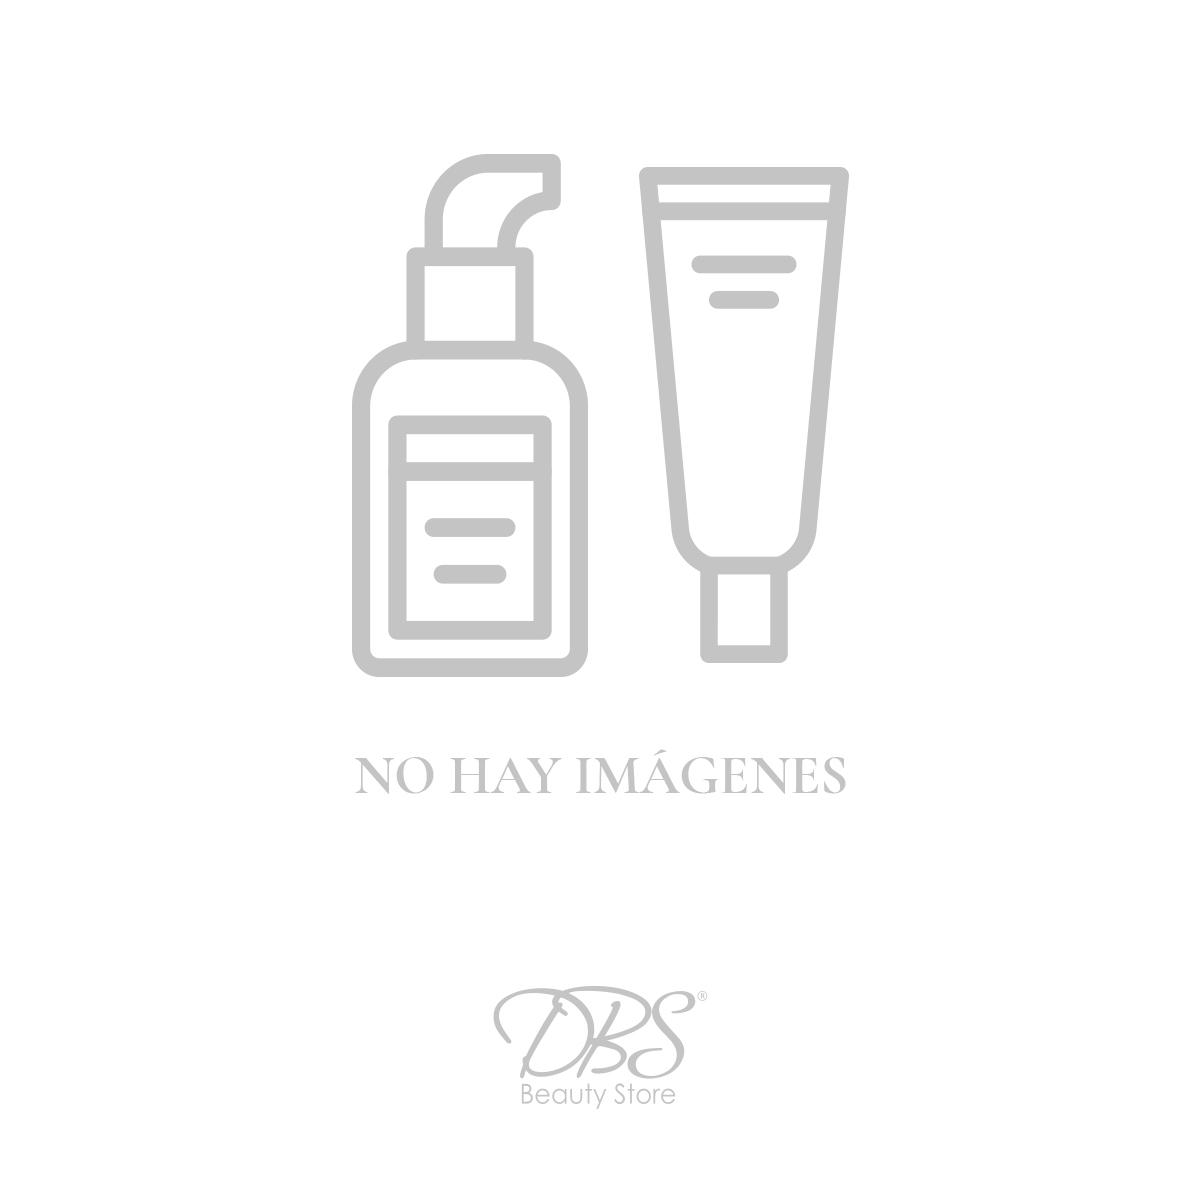 body-luxuries-BL-XC1877-MP.jpg